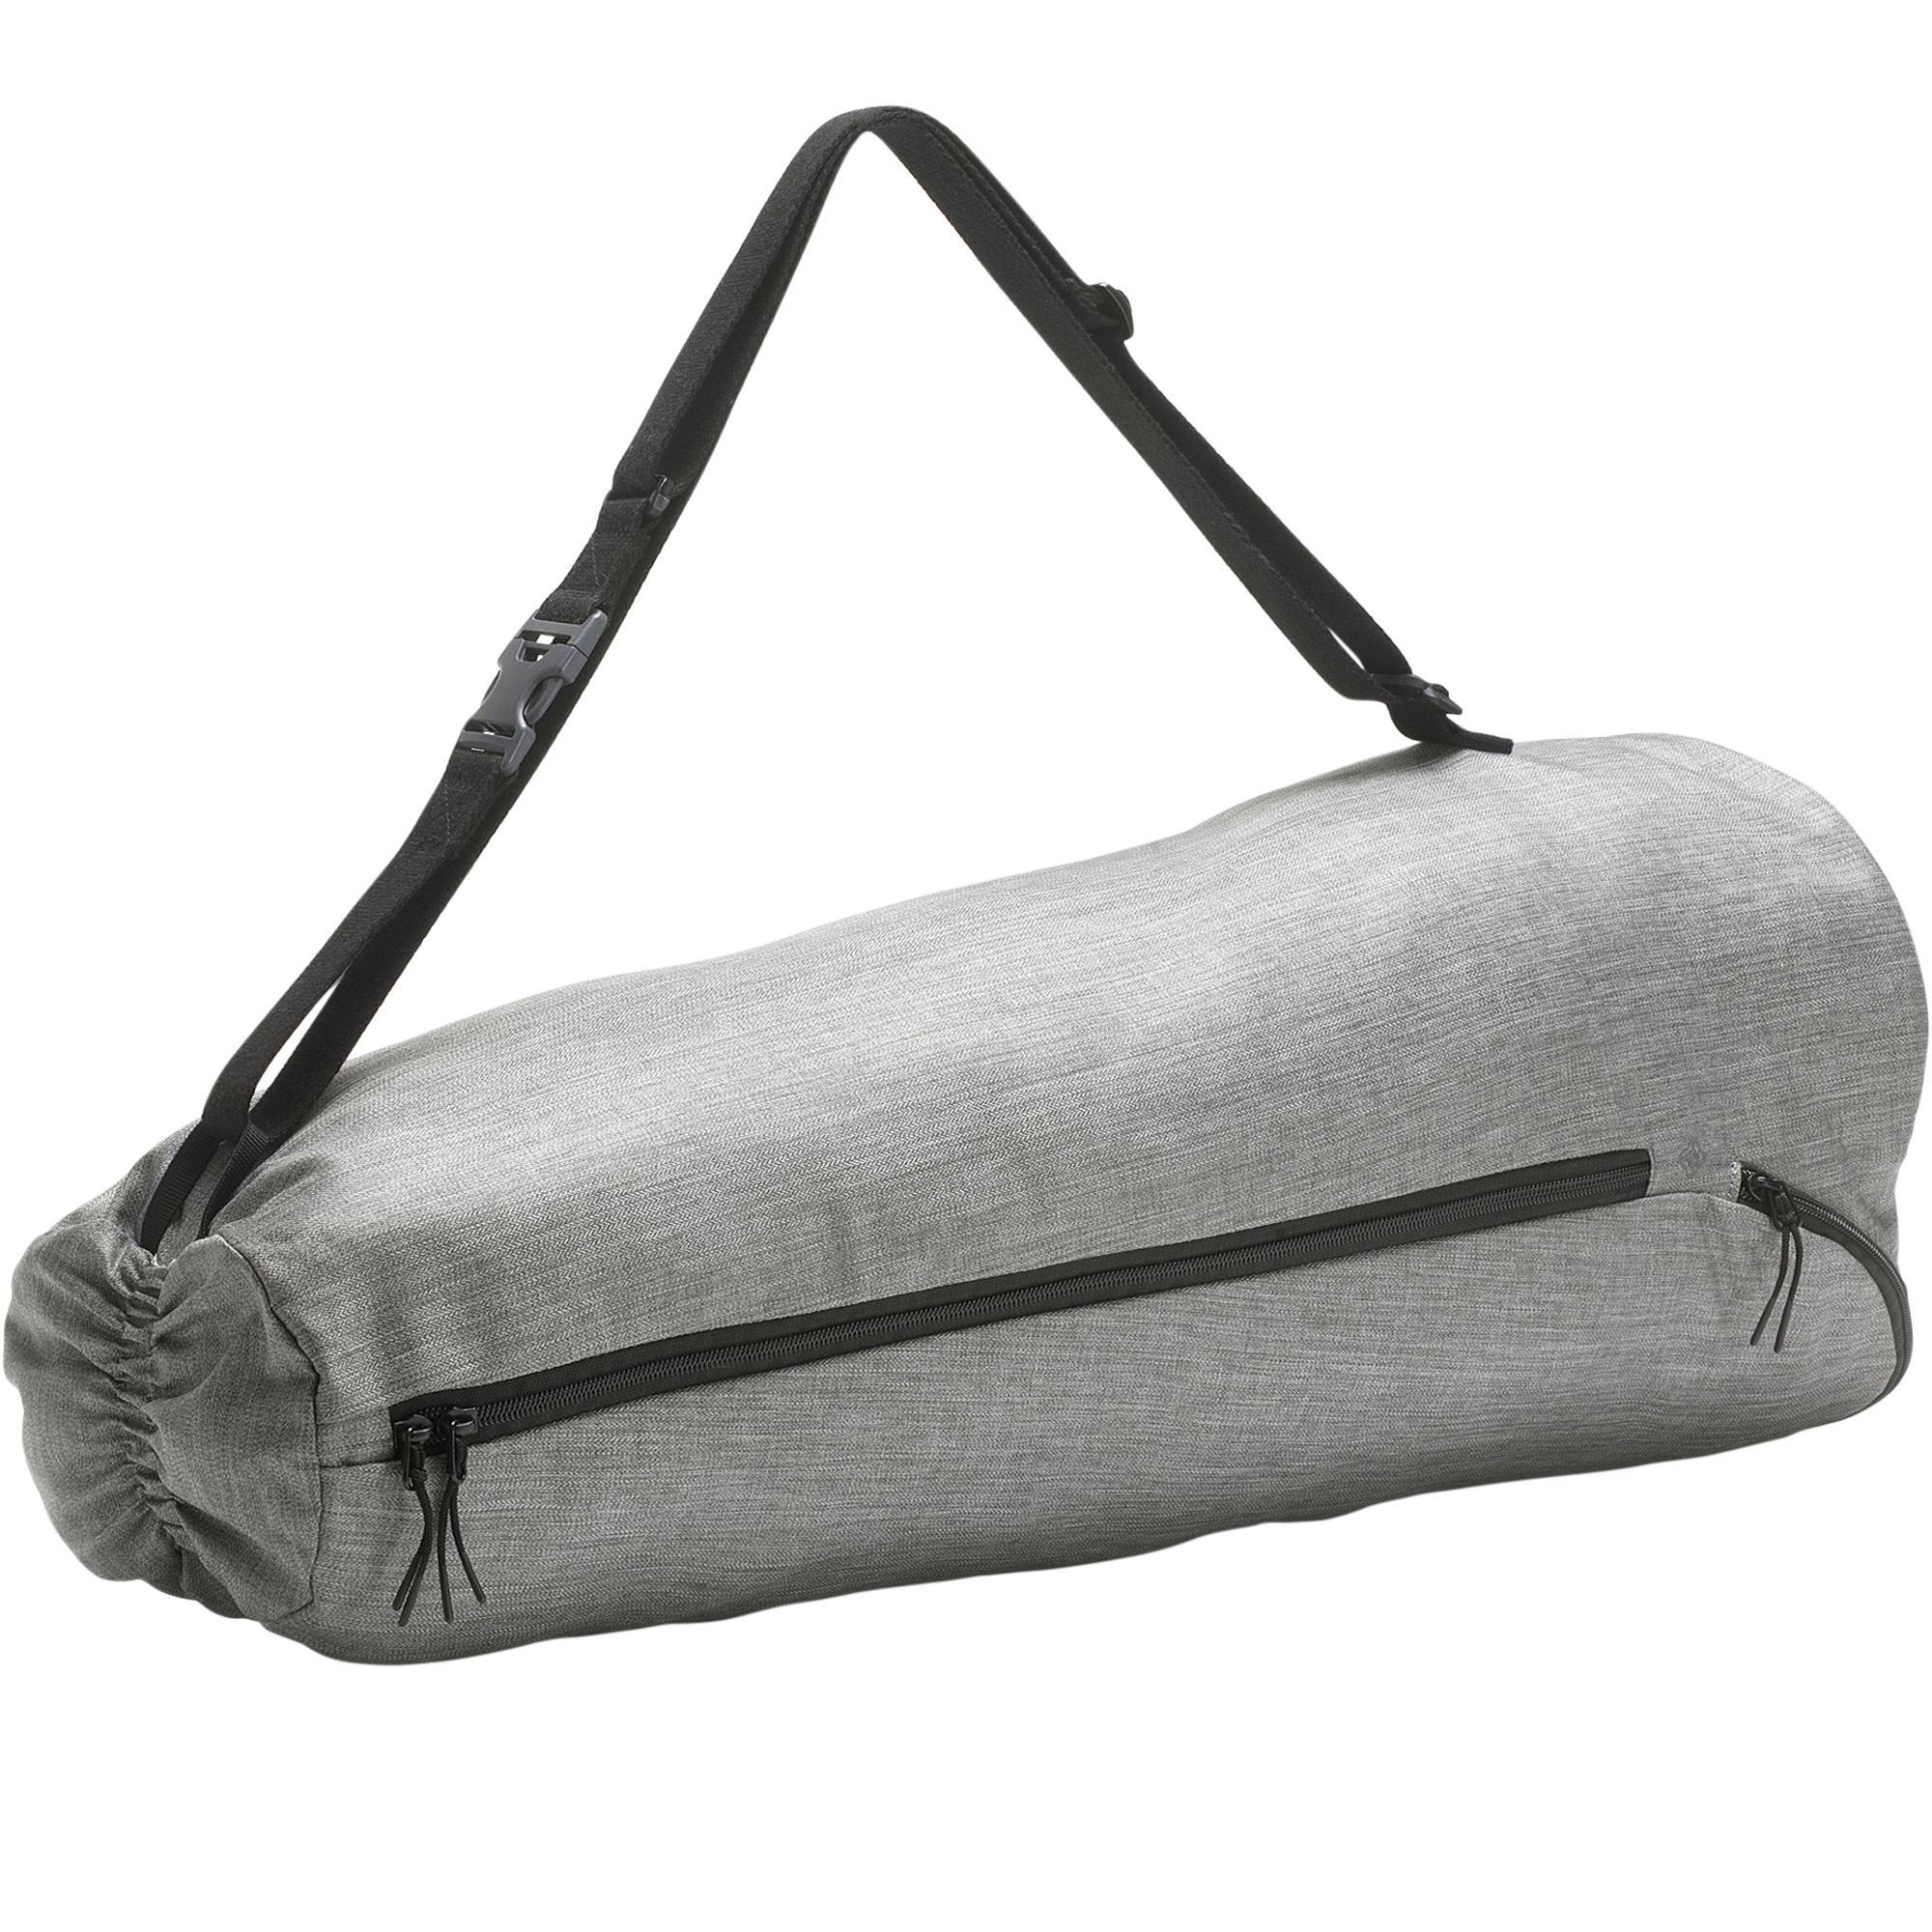 Yoga Equipment - Decathlon 989c0ea5a25f4